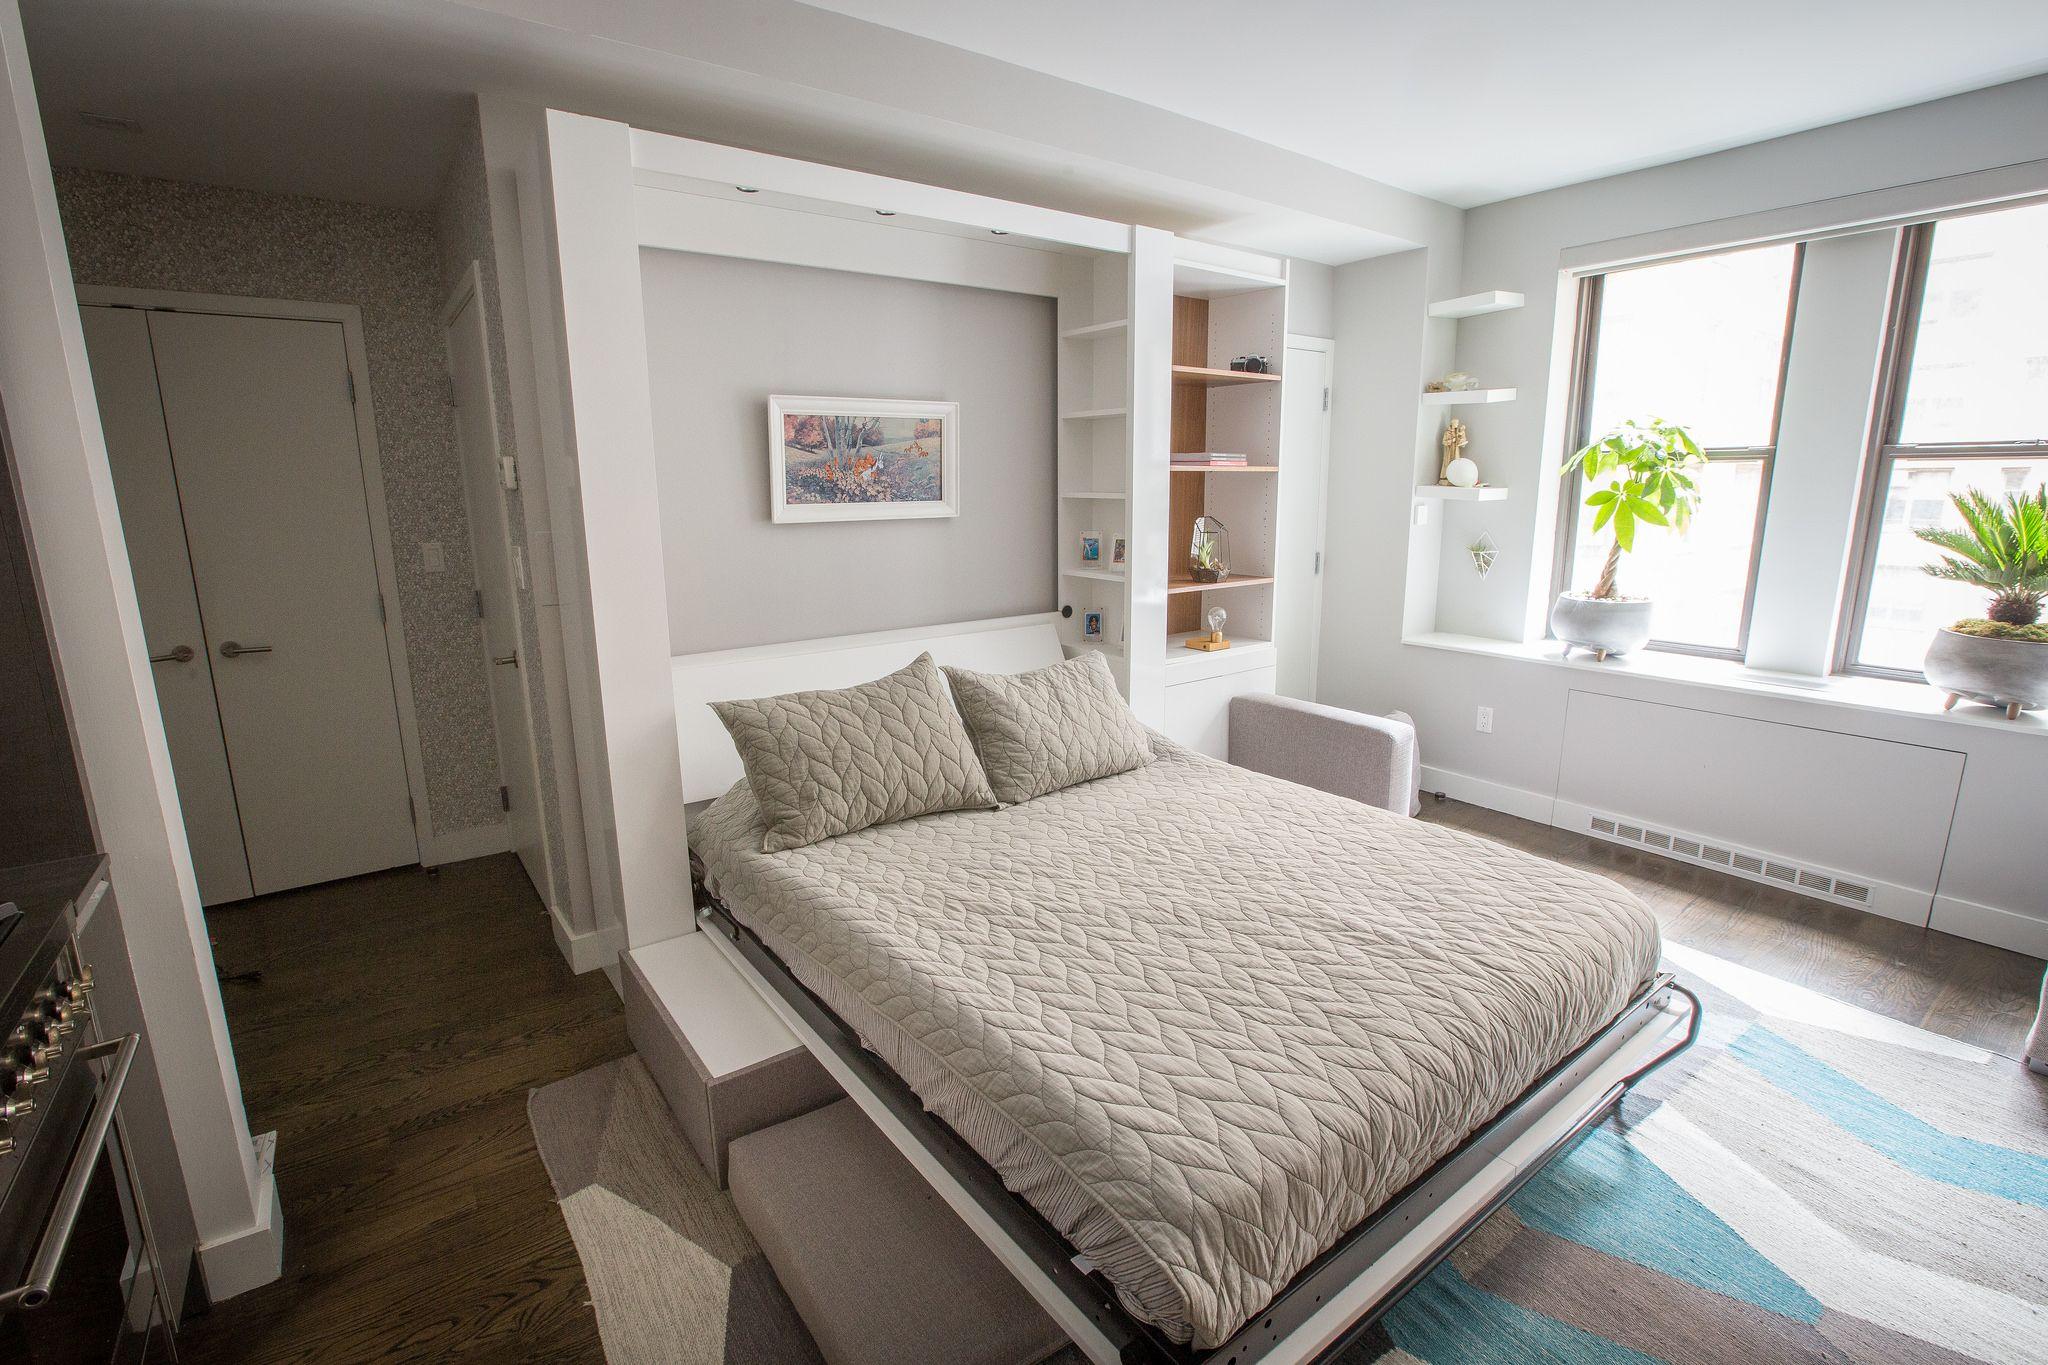 Space Optimized Apartment hacks, Small studio apartments